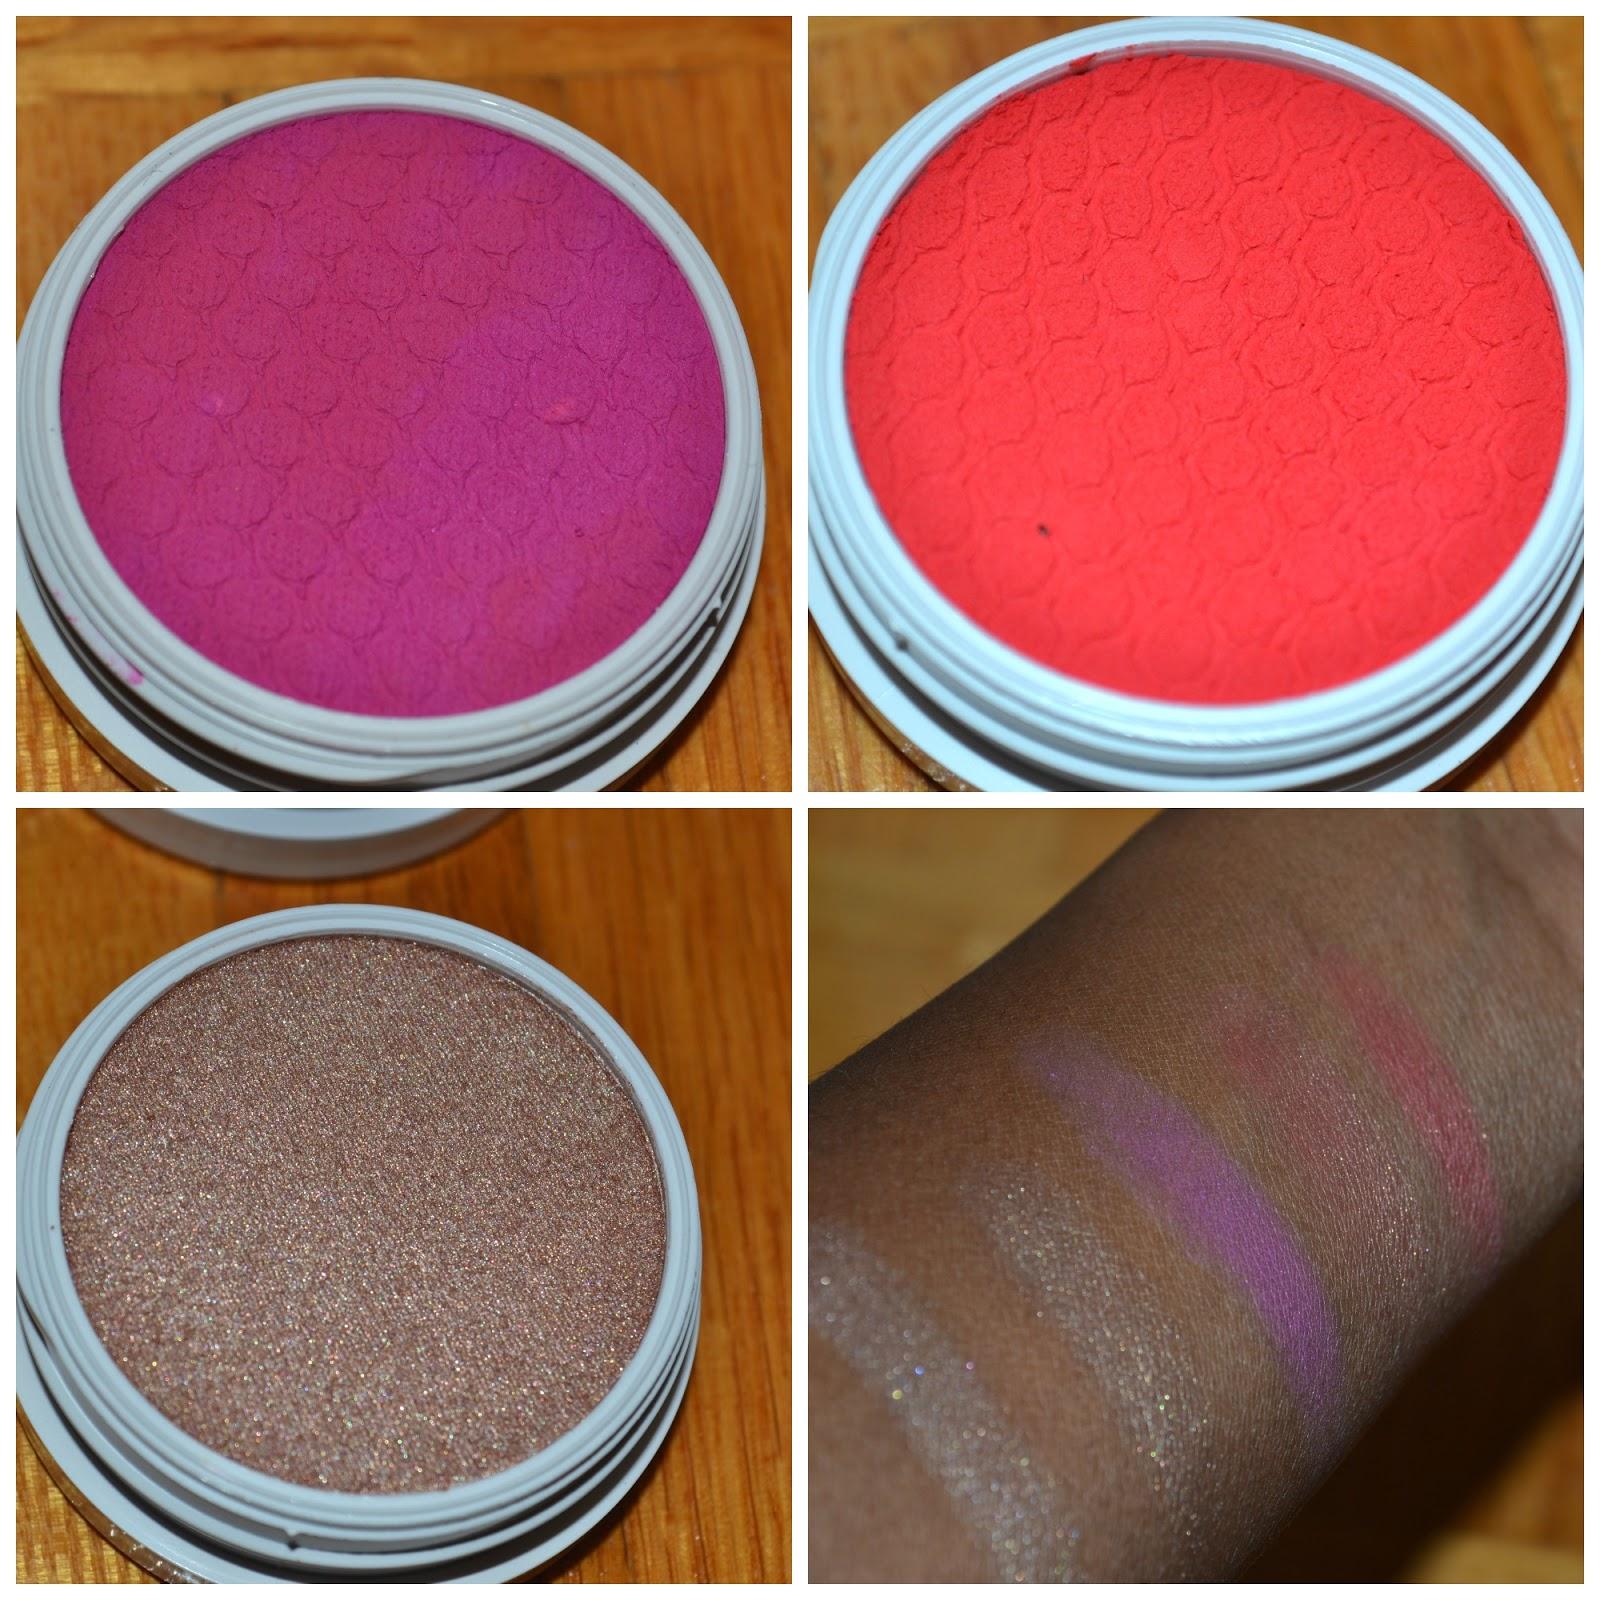 colourpop haul, colourpop ultra matte lip, colourpop swatches on dark skin, colourpop lippie stix, lightsfashionbeauty, affordable makeup for dark skin, montreal beauty blogger